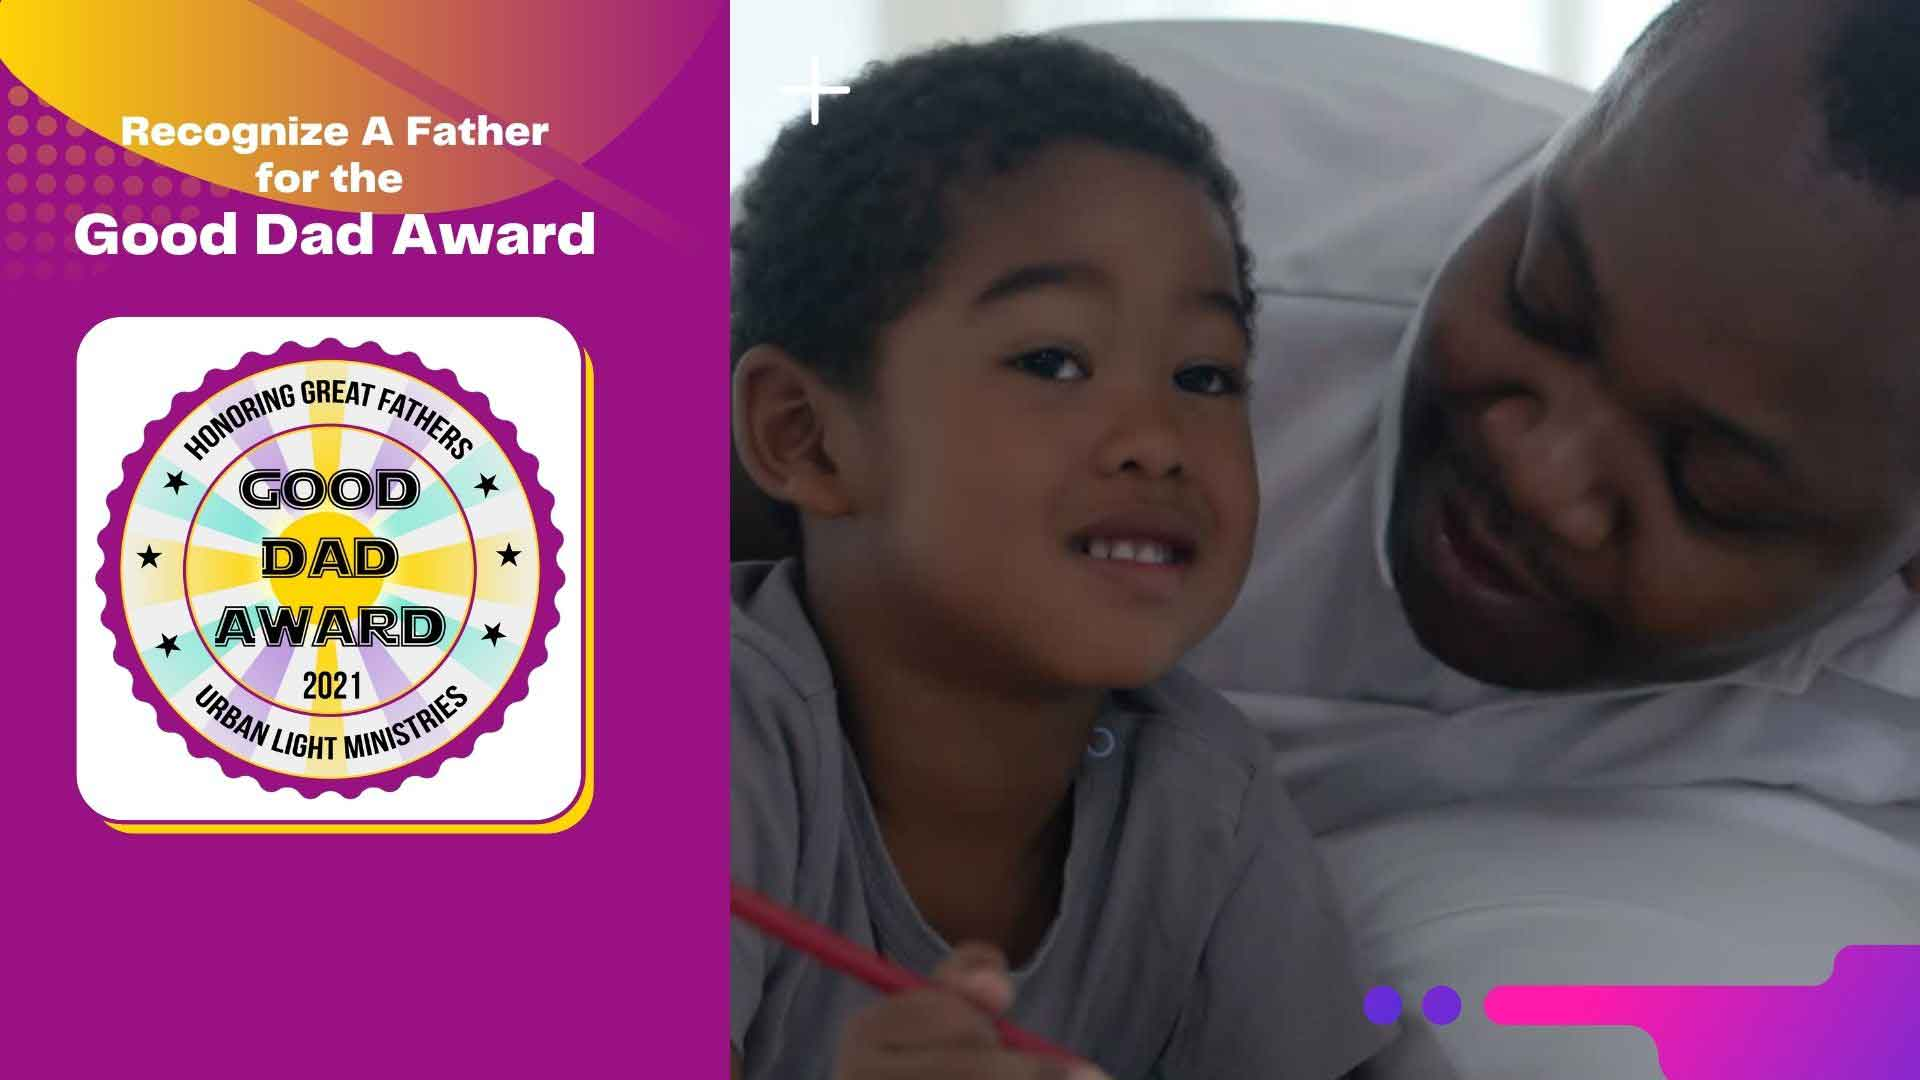 Good Dad Award